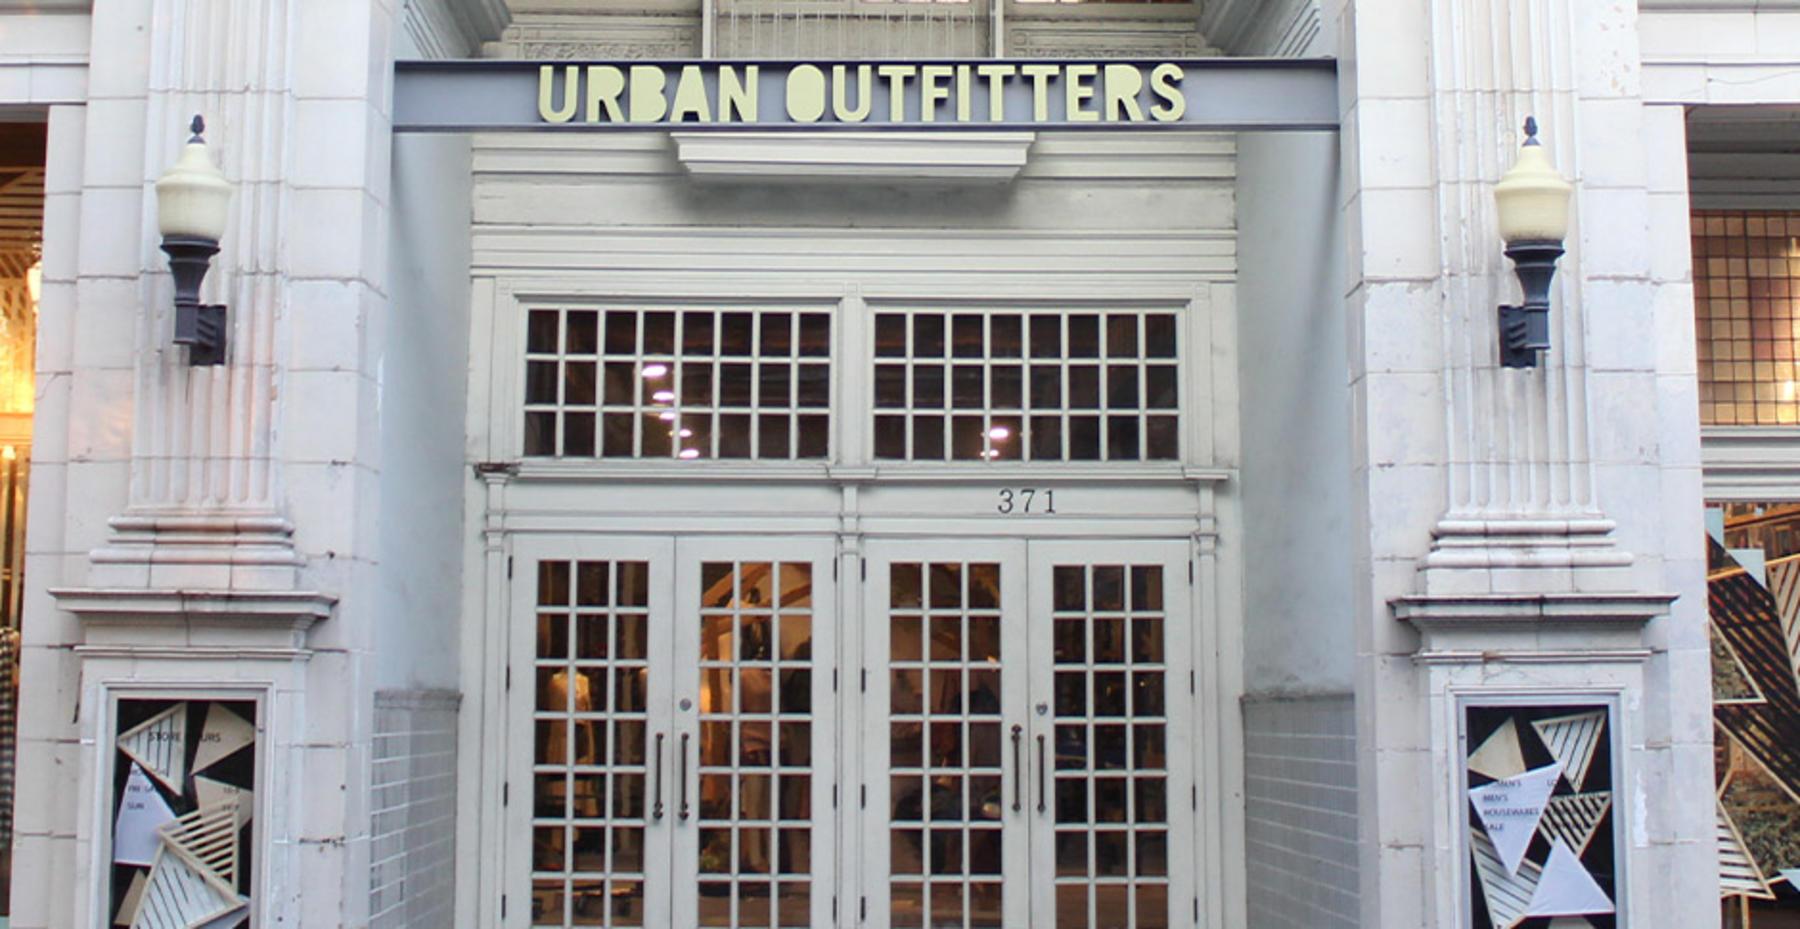 charleston sc charleston sc urban outfitters